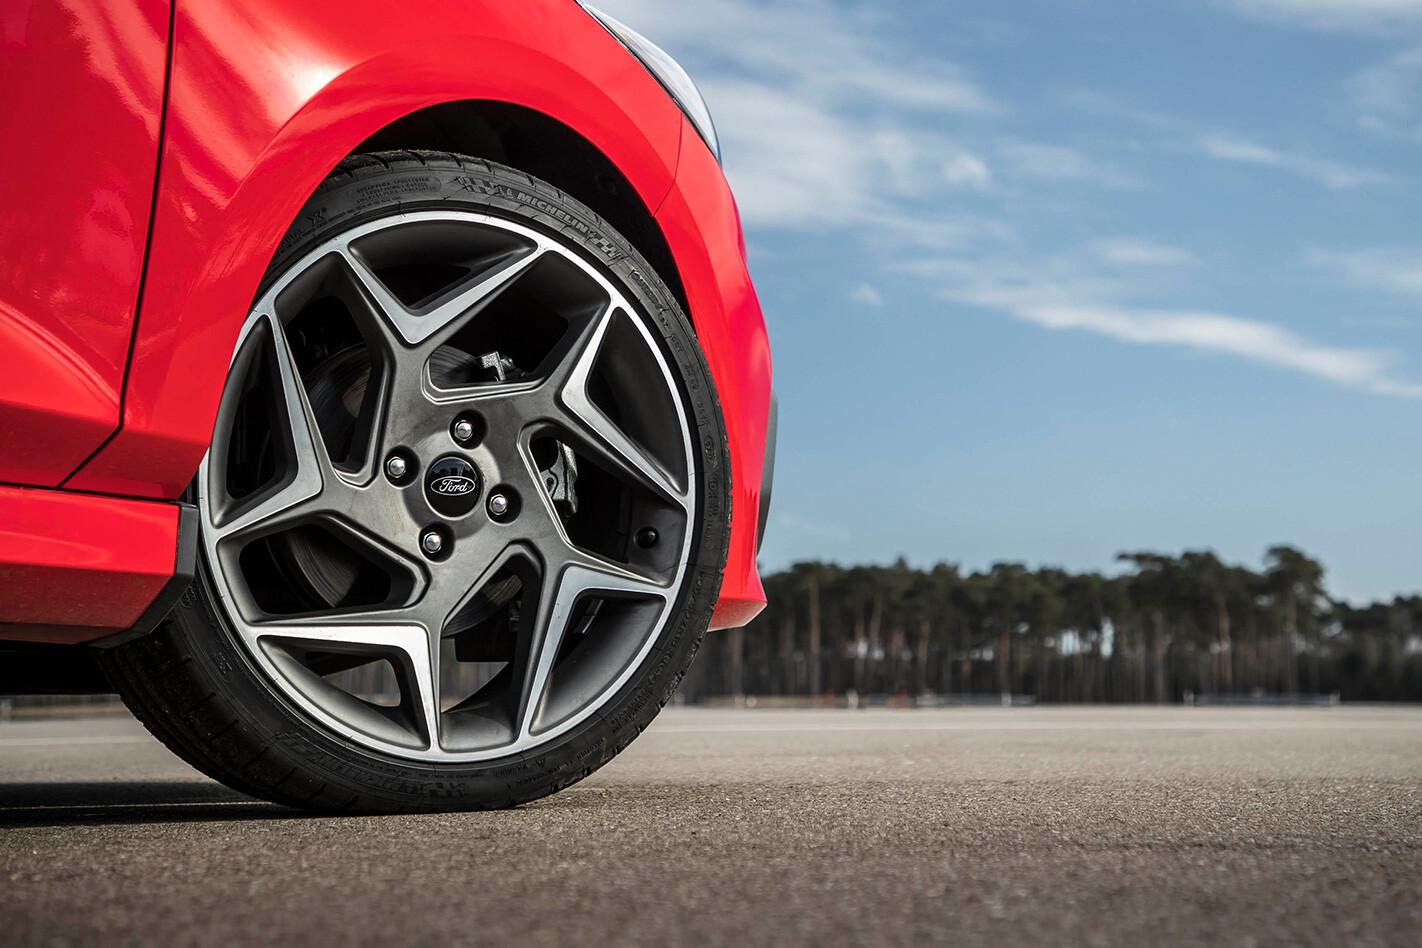 Ford Fiesta St Lead Wheels Jpg